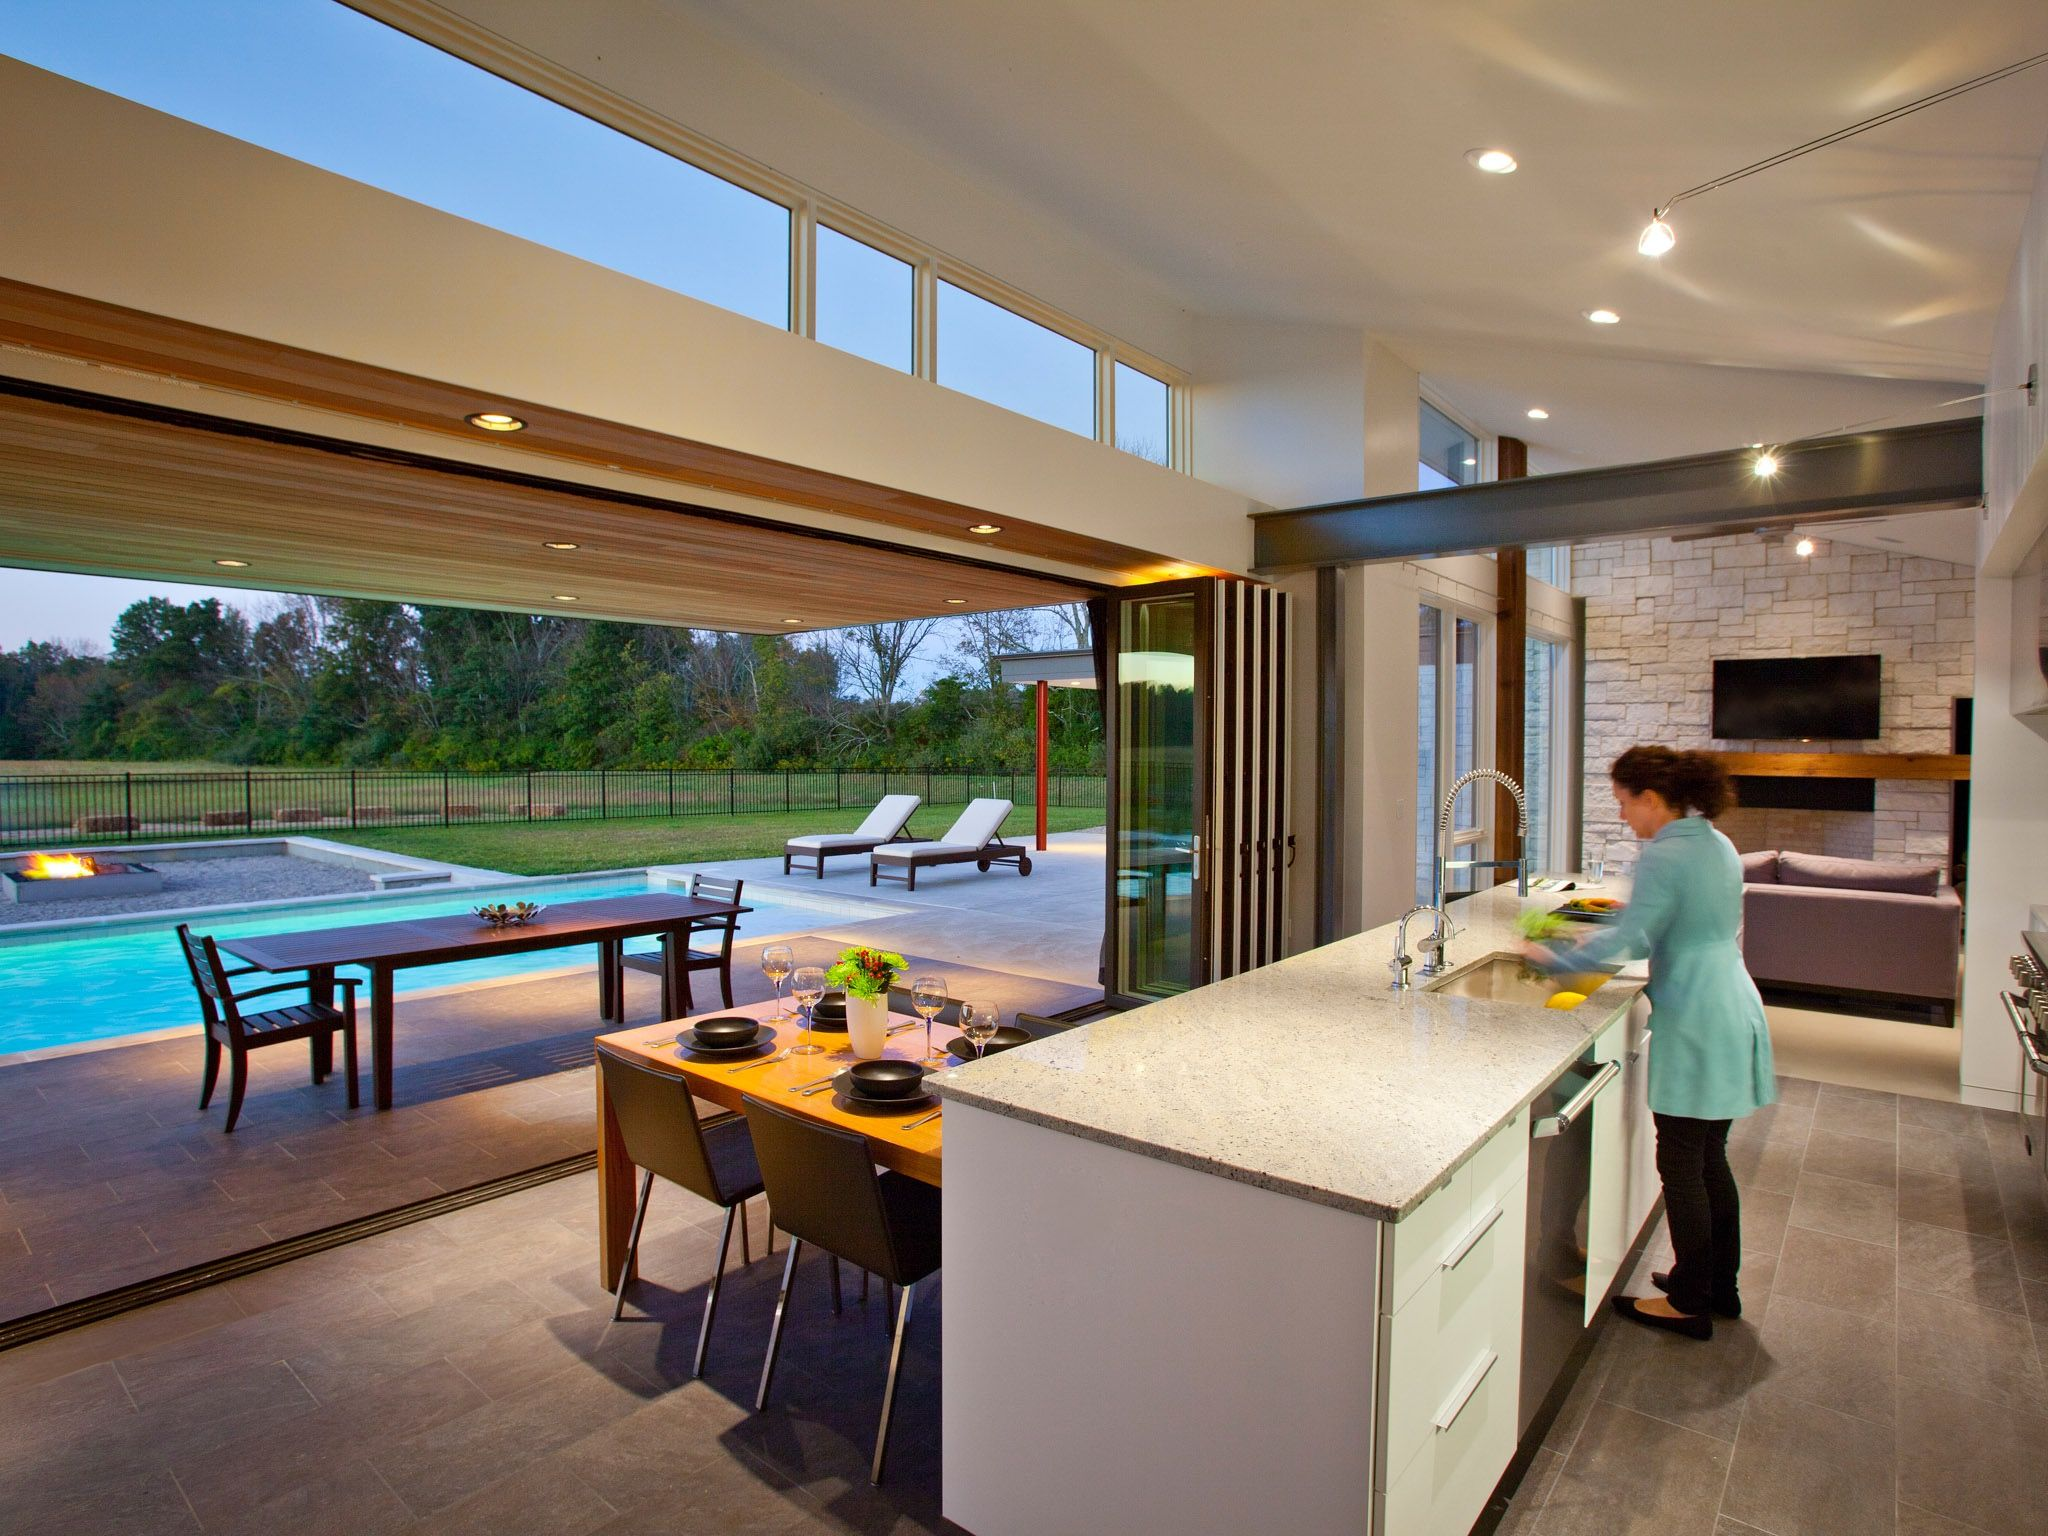 Image Result For Modern Open Plan Kitchen With Bifold Doors Modern Kitchen Open Plan Lake House Bathroom Kitchen Design Modern Contemporary